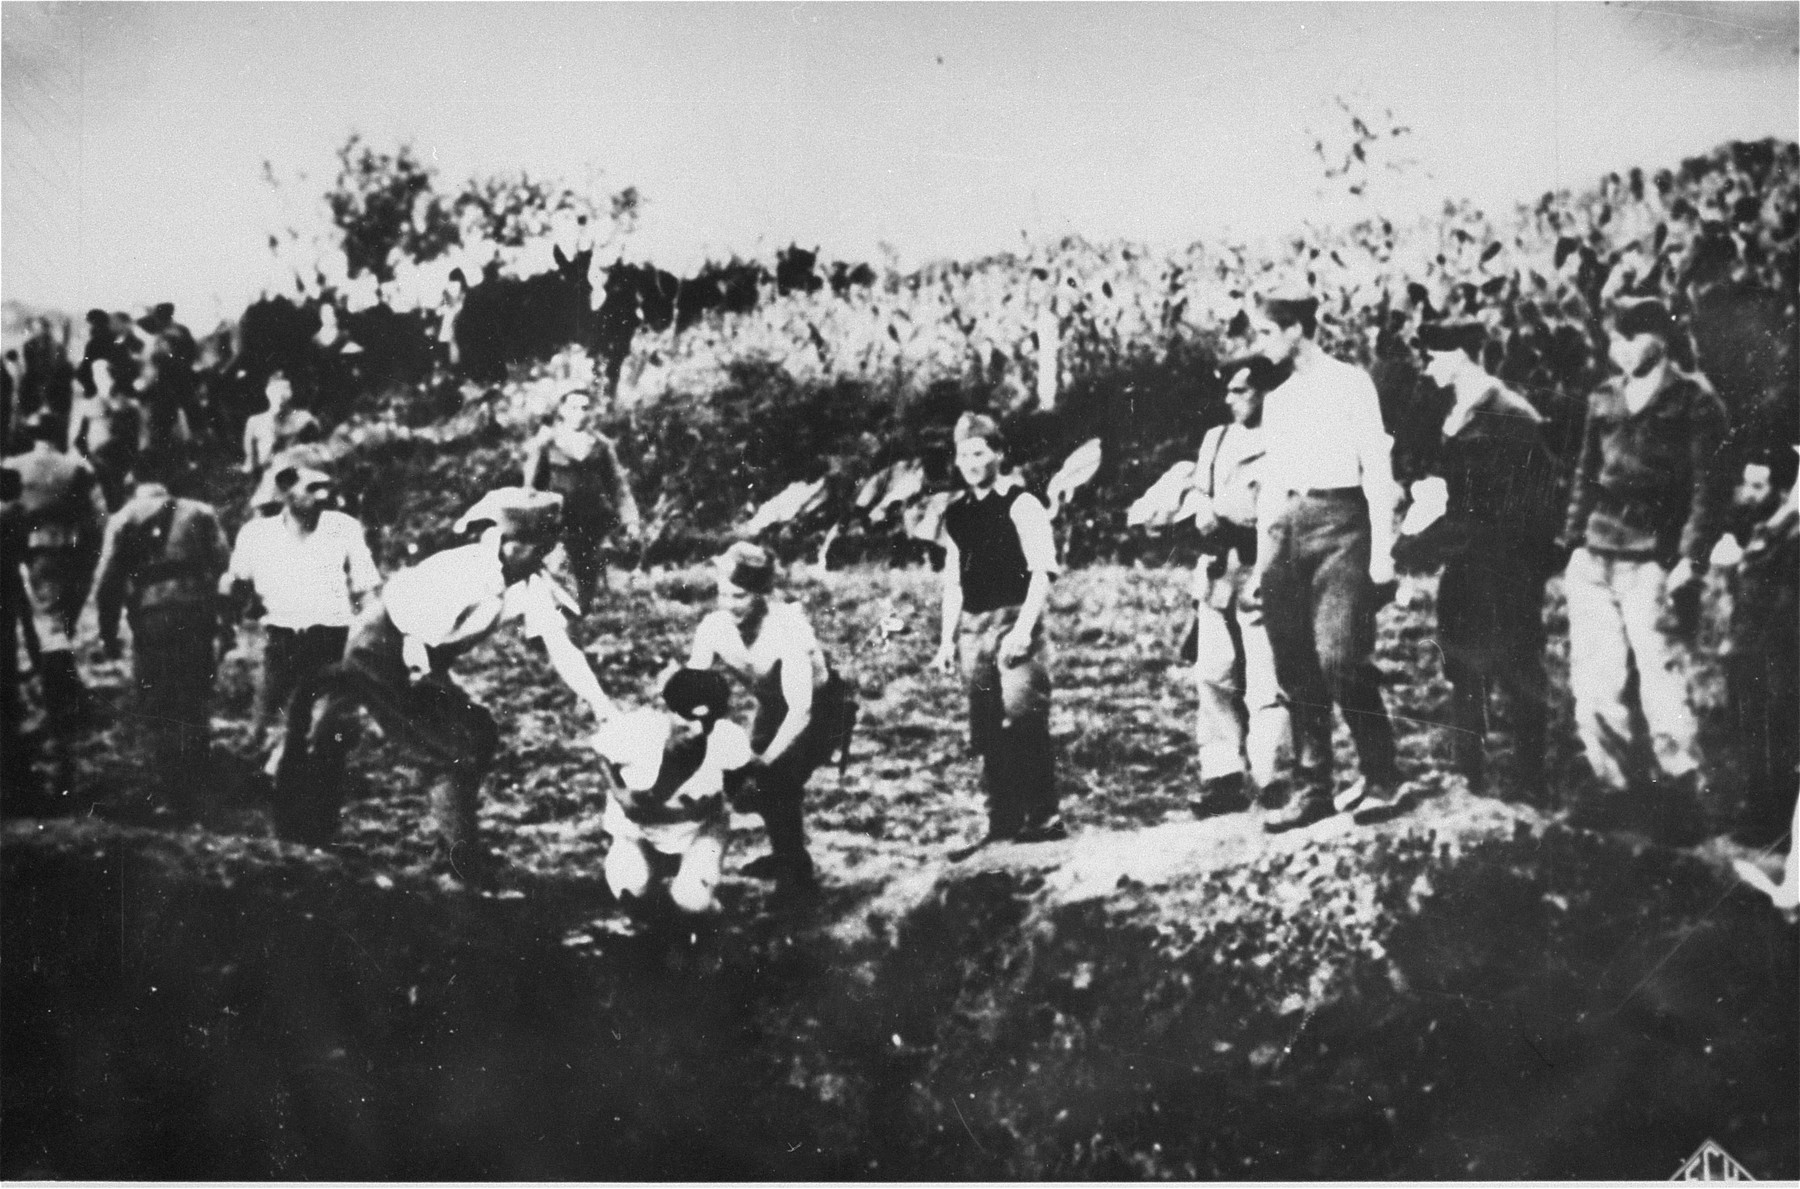 Ustasa militia execute prisoners near the Jasenovac concentration camp.